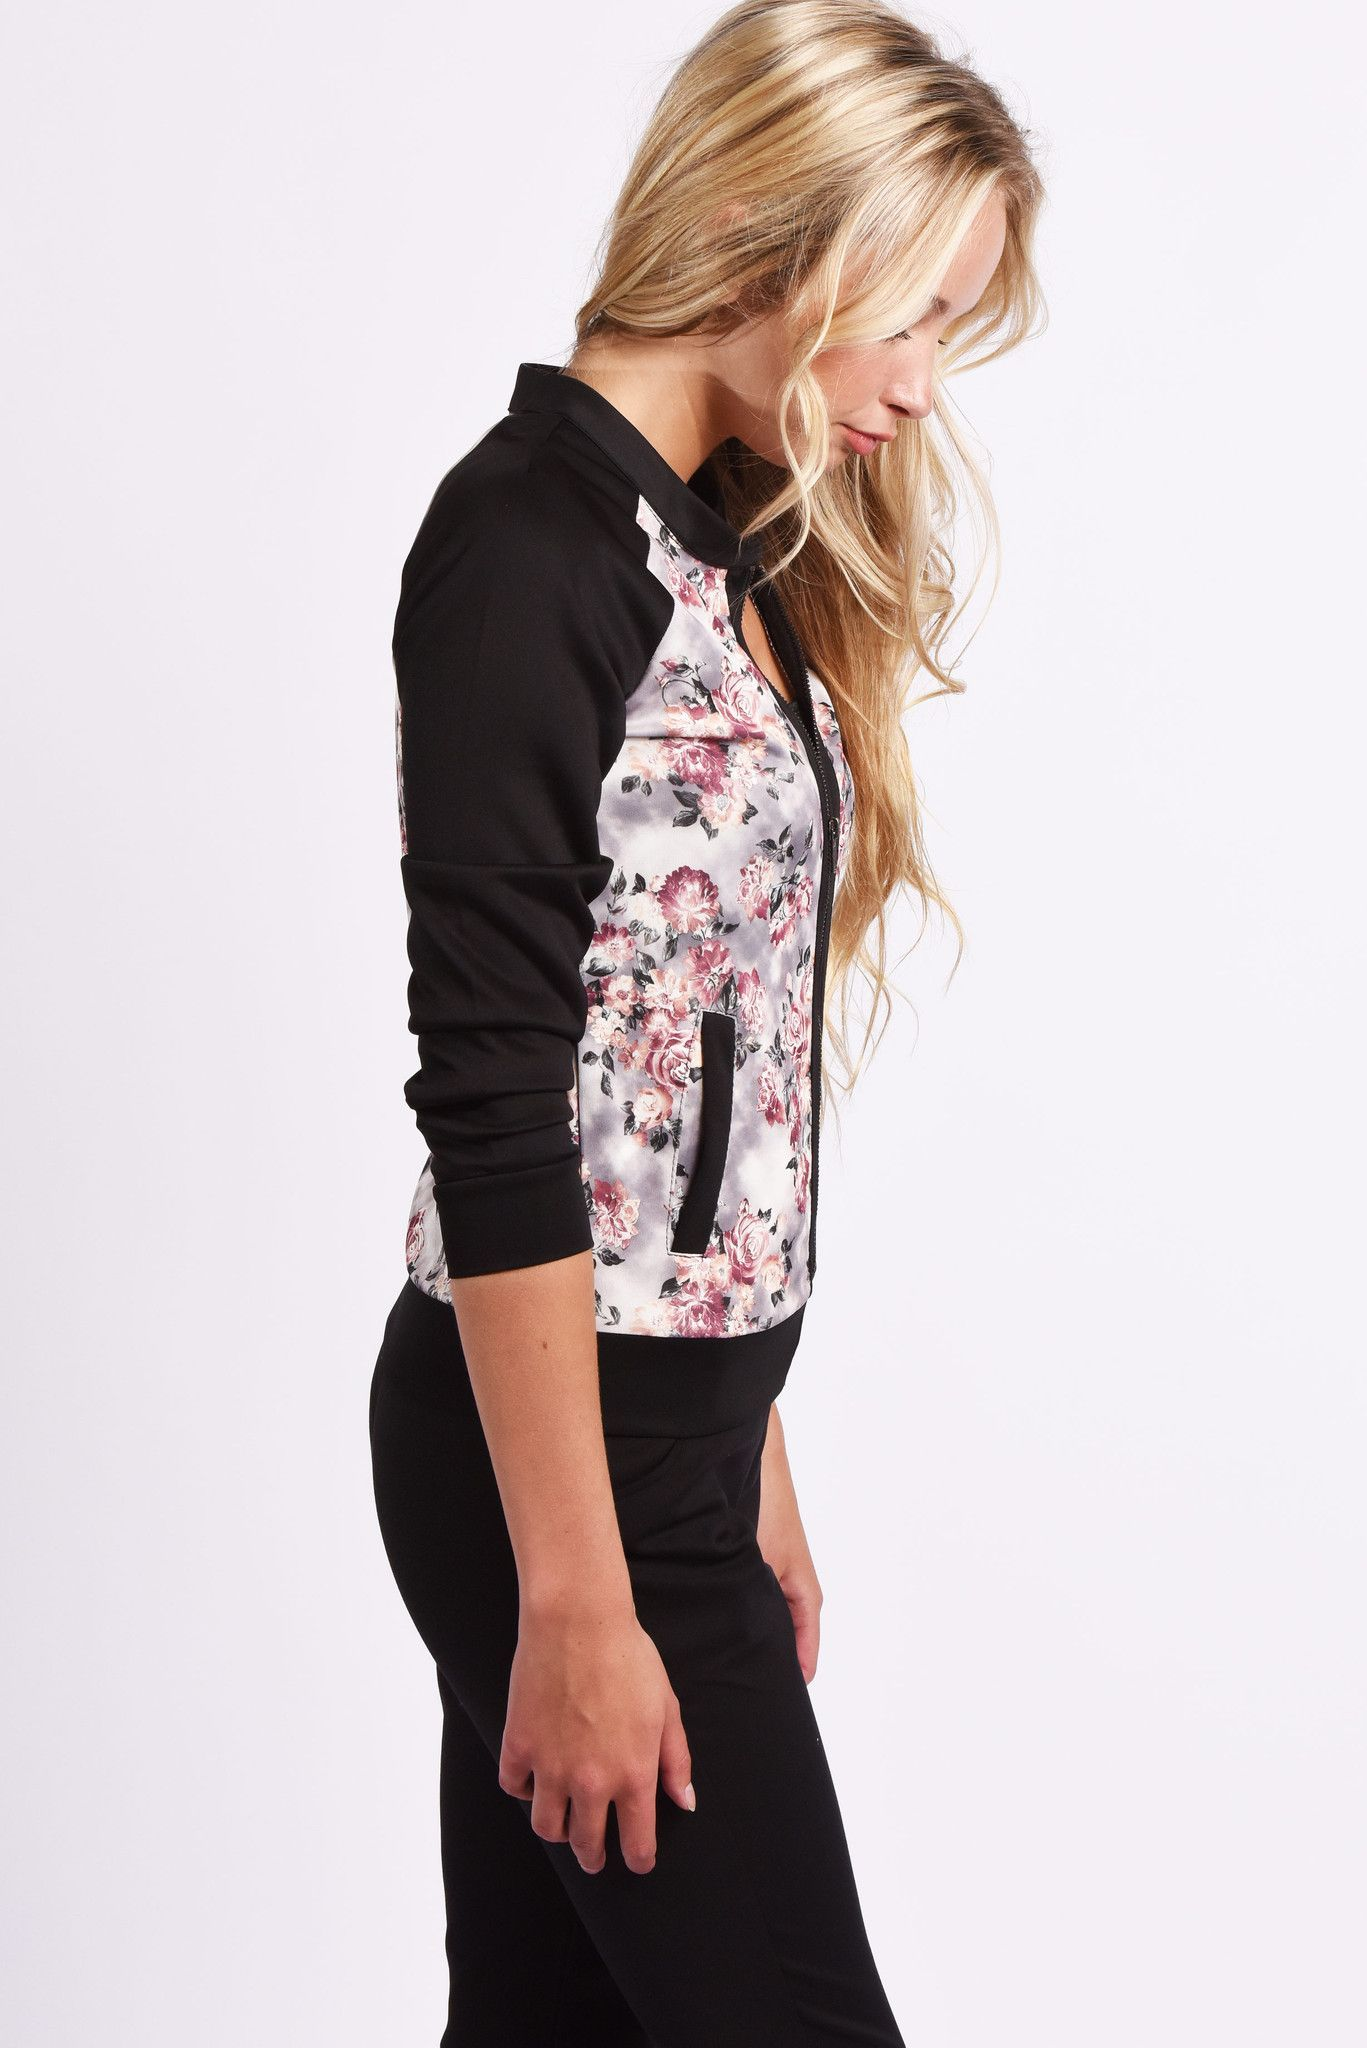 Midnight Garden Floral Bomber Jacket #25-75 #bomber #floral #jackets #l #m #pockets #print #raglan #rose #rosy #s #spring #summer #women #womens #zip